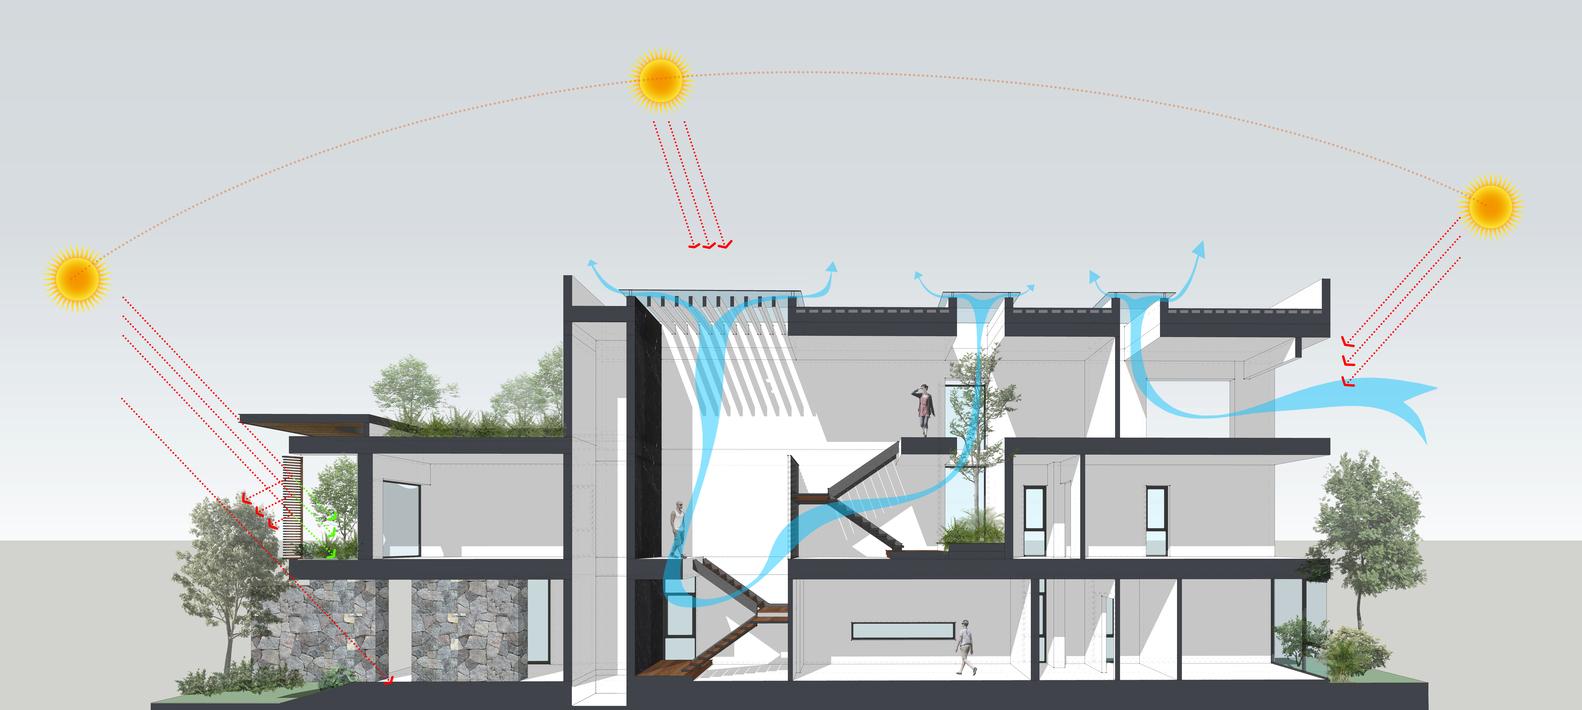 medium resolution of house of light wind ray architecture viet nam diagram 03